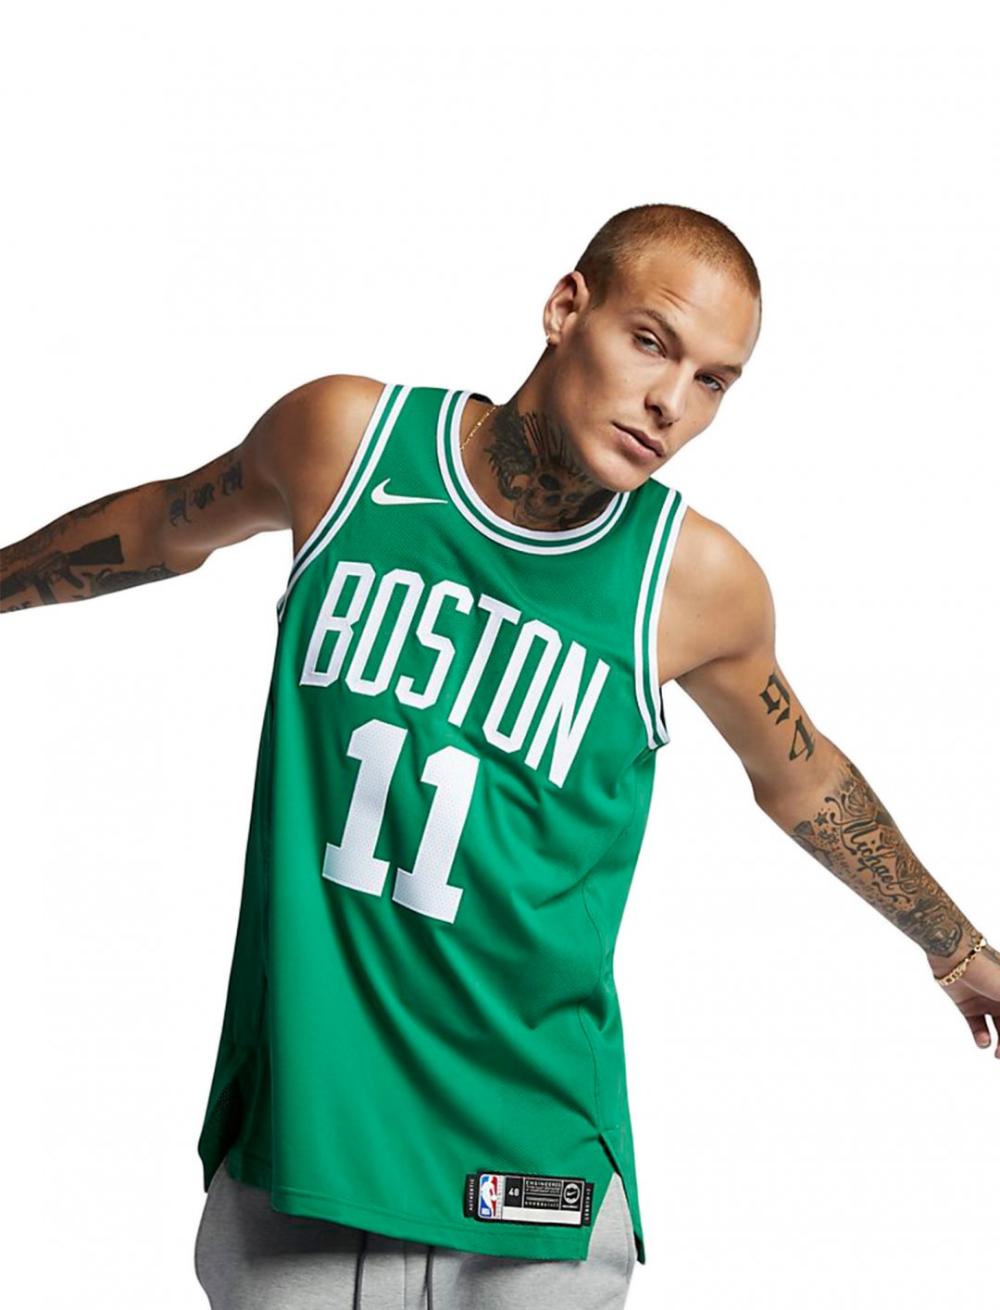 Kyrie Irving Jersey, Green, Celtics, Nike | Post Kulture | Boston celtics, Kyrie  irving celtics, Jayson tatum